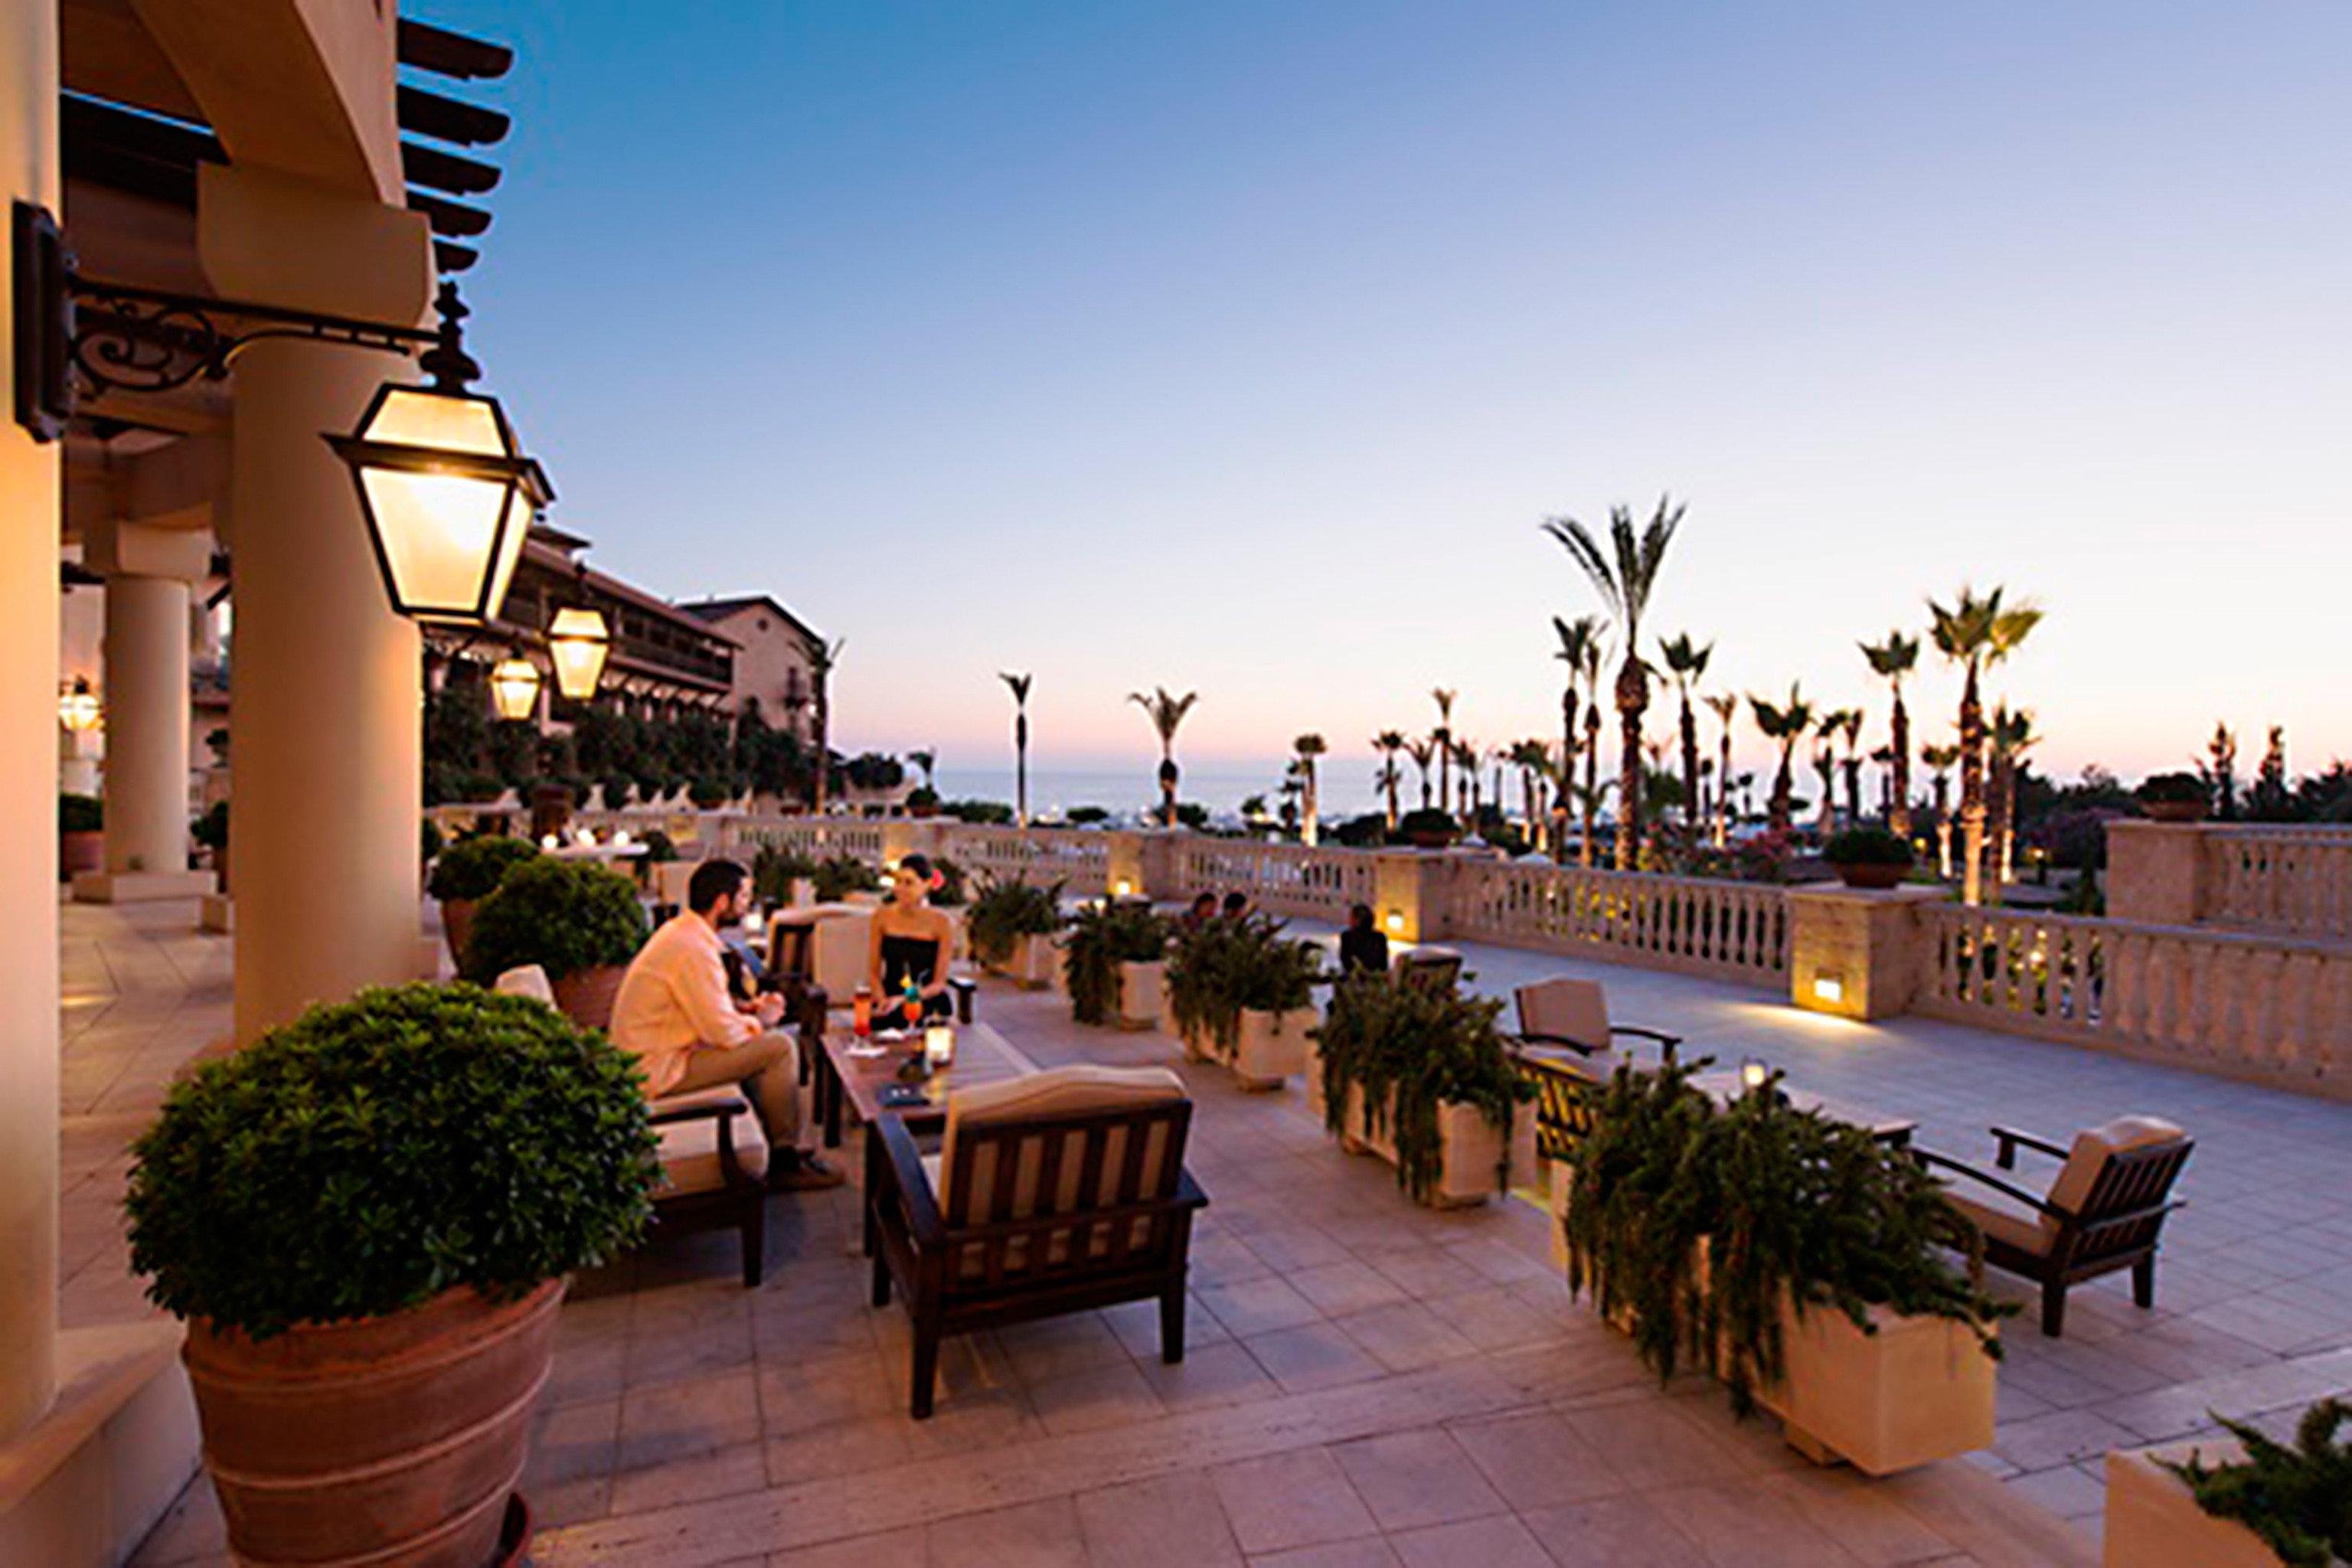 Bar Dining Drink Eat Luxury Romantic Scenic views sky Resort plaza walkway restaurant evening palace travel